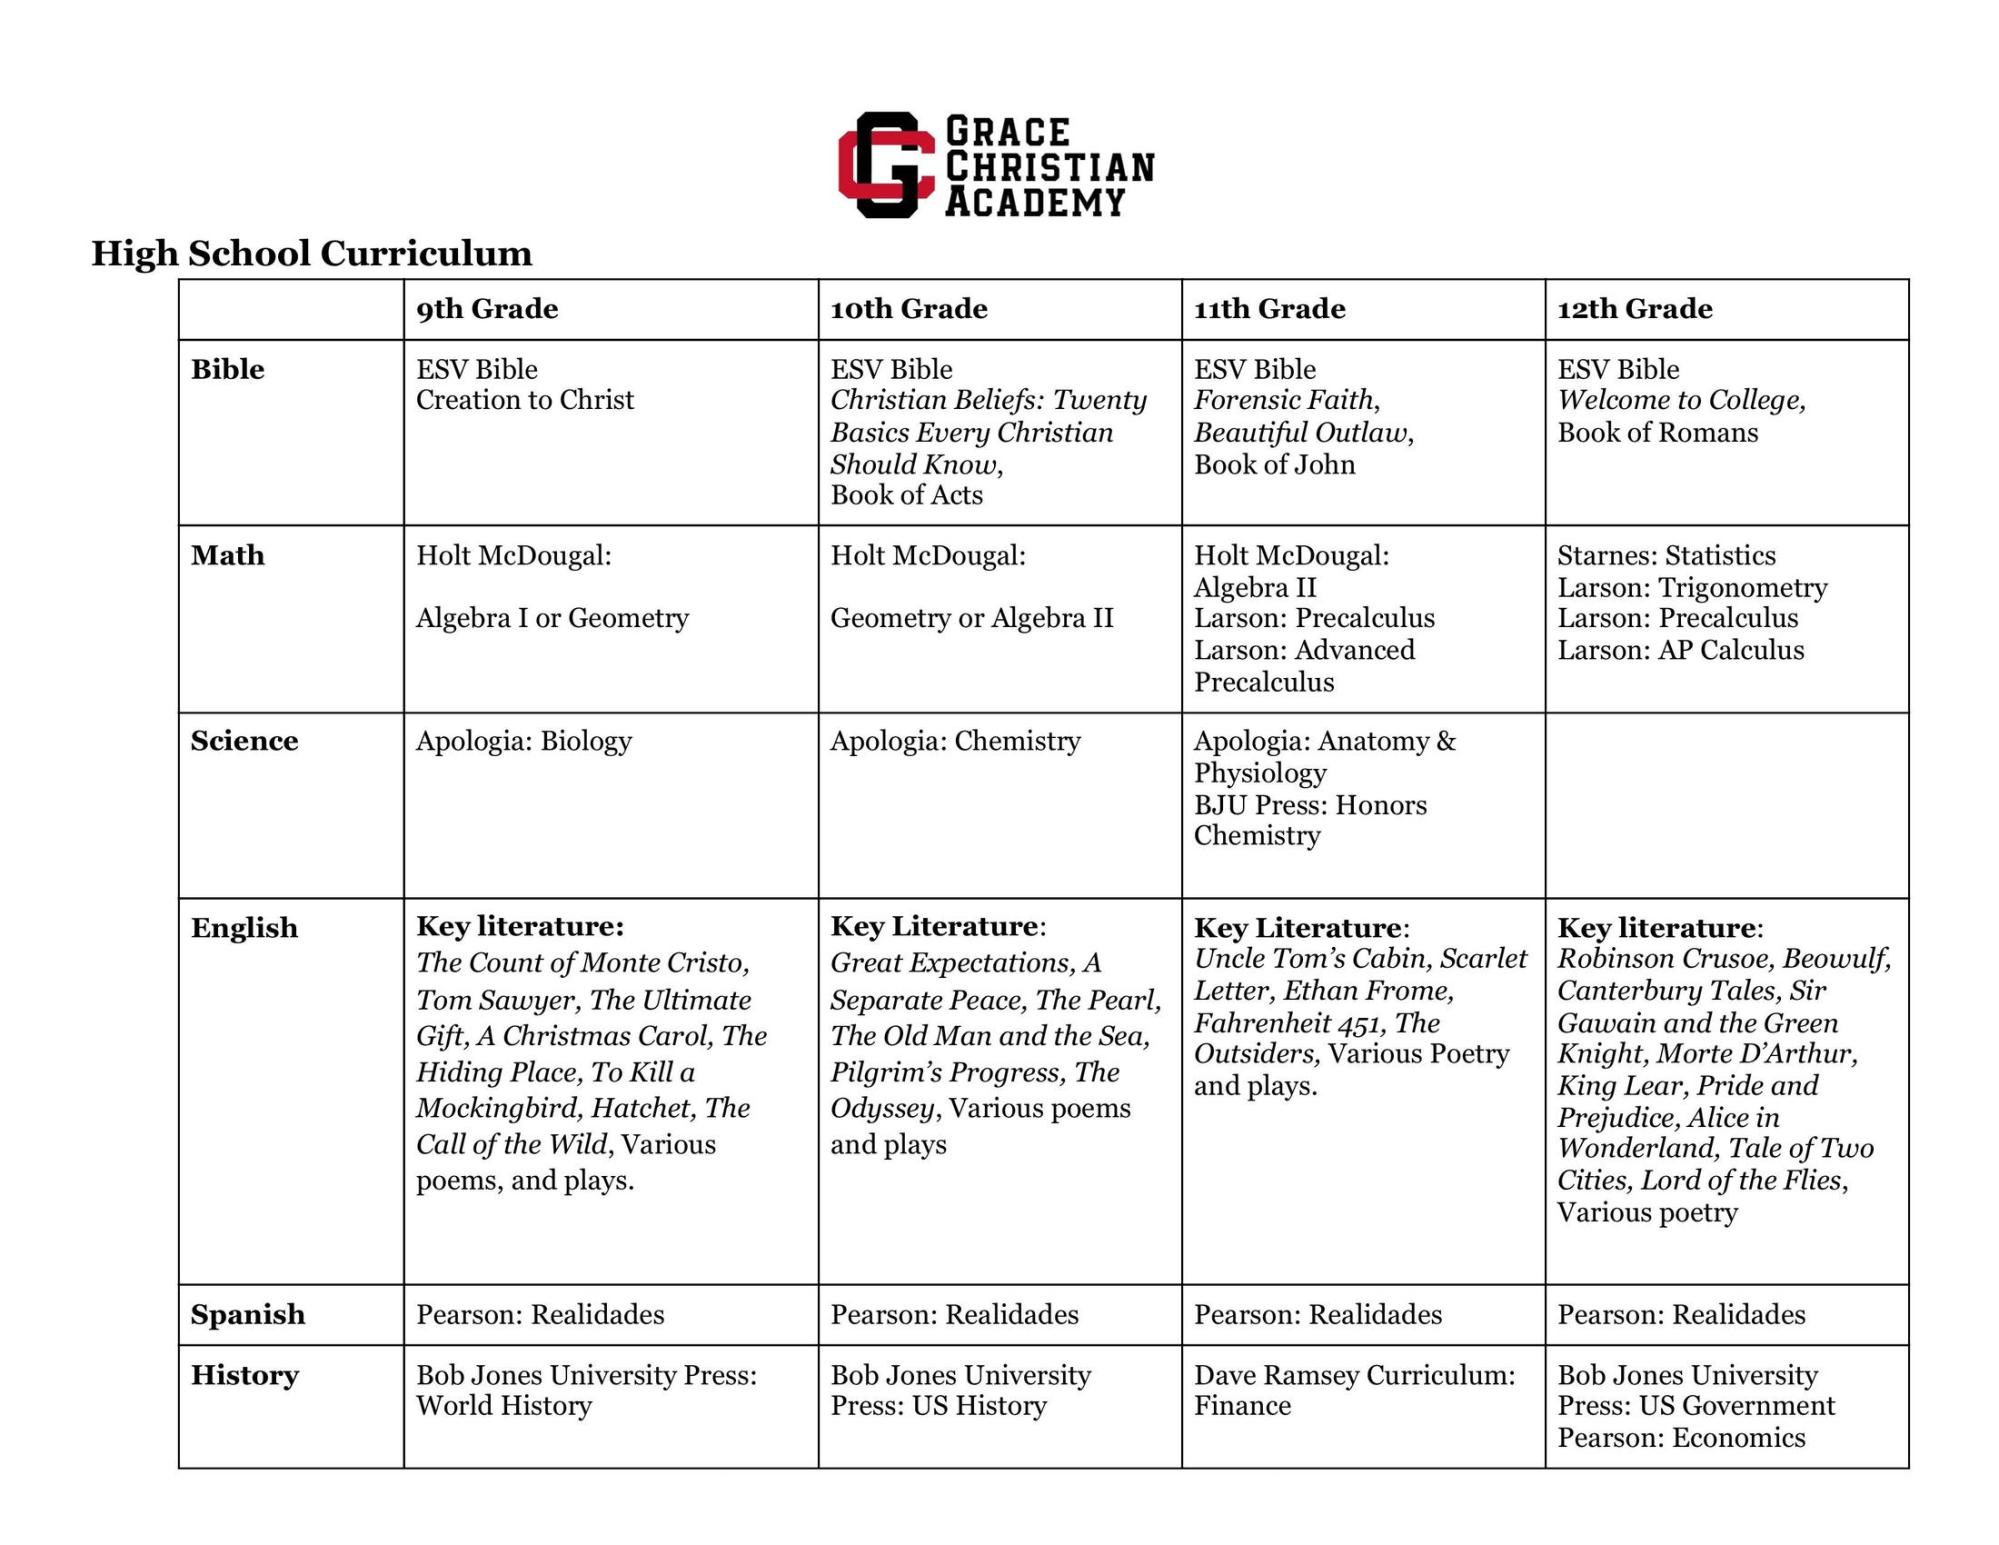 hight resolution of Curriculum - Grade Levels - Grace Christian Academy